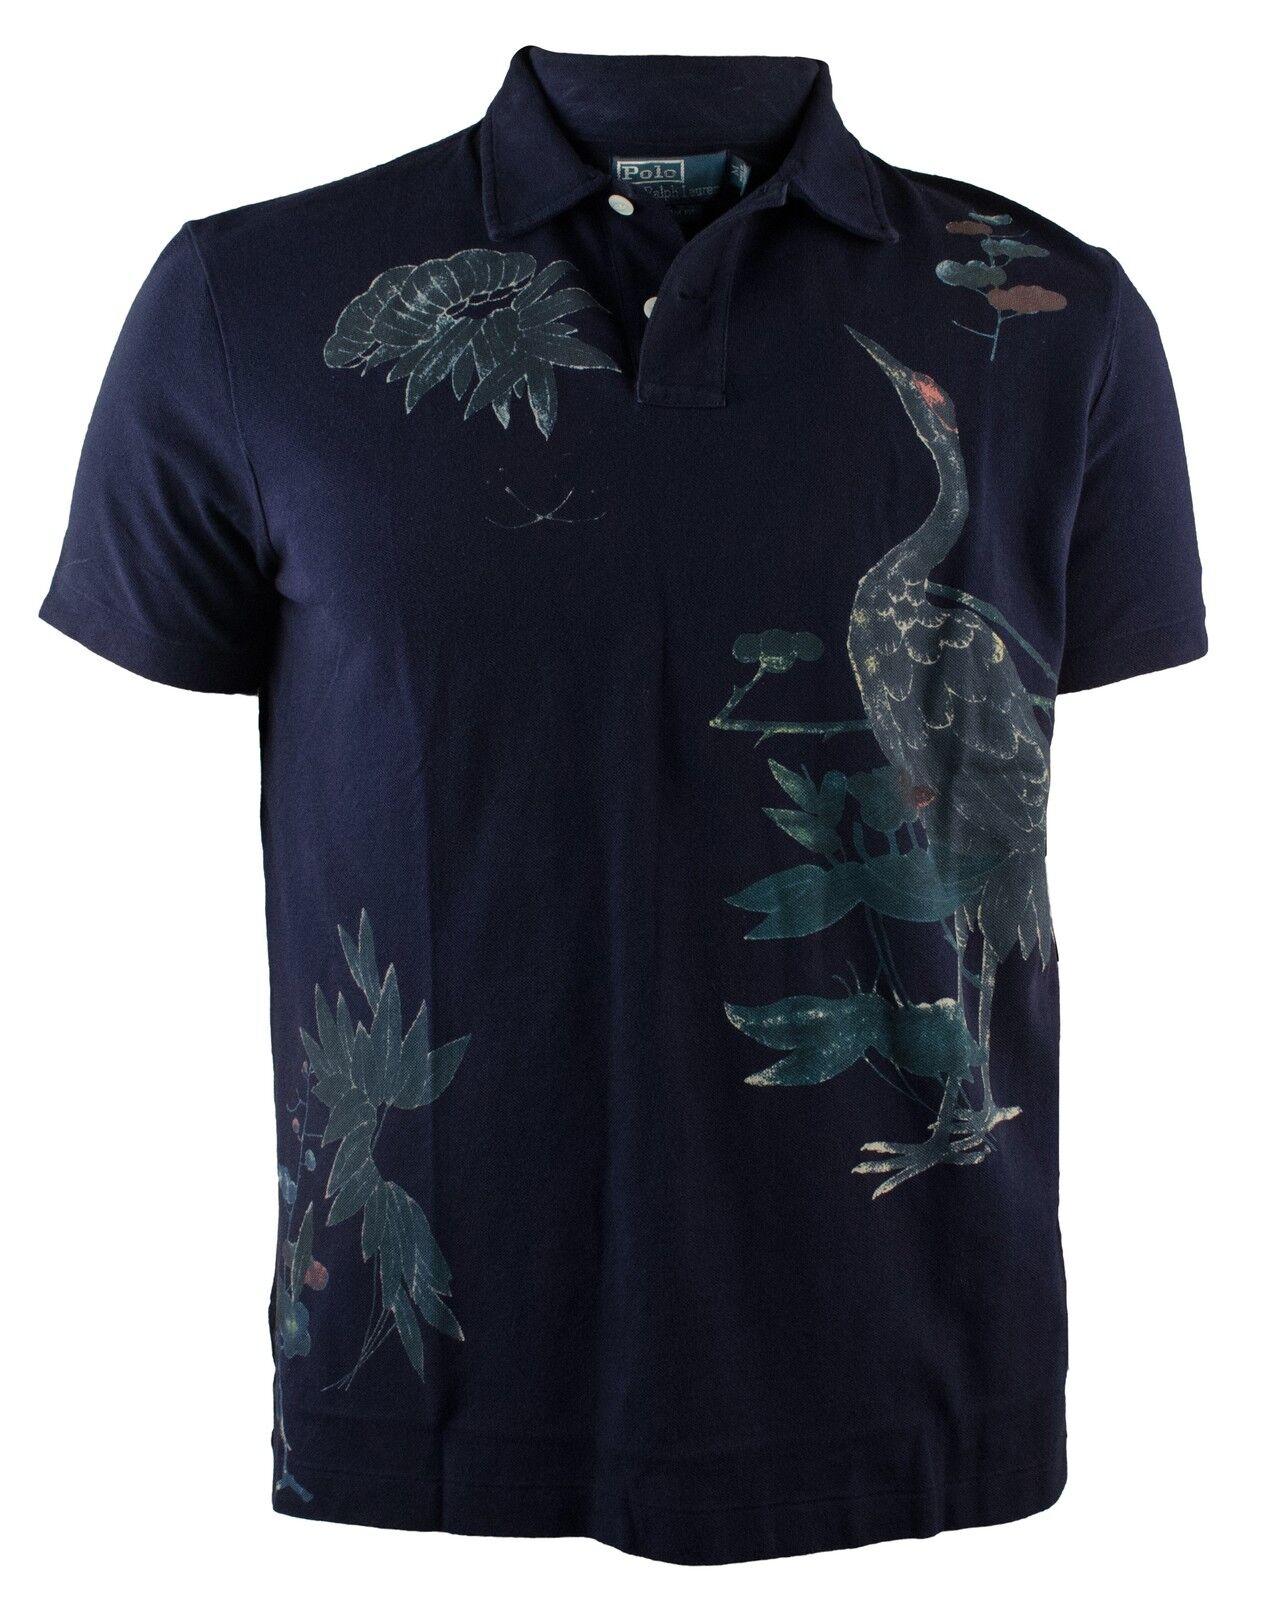 Custom Printed Polo Shirt